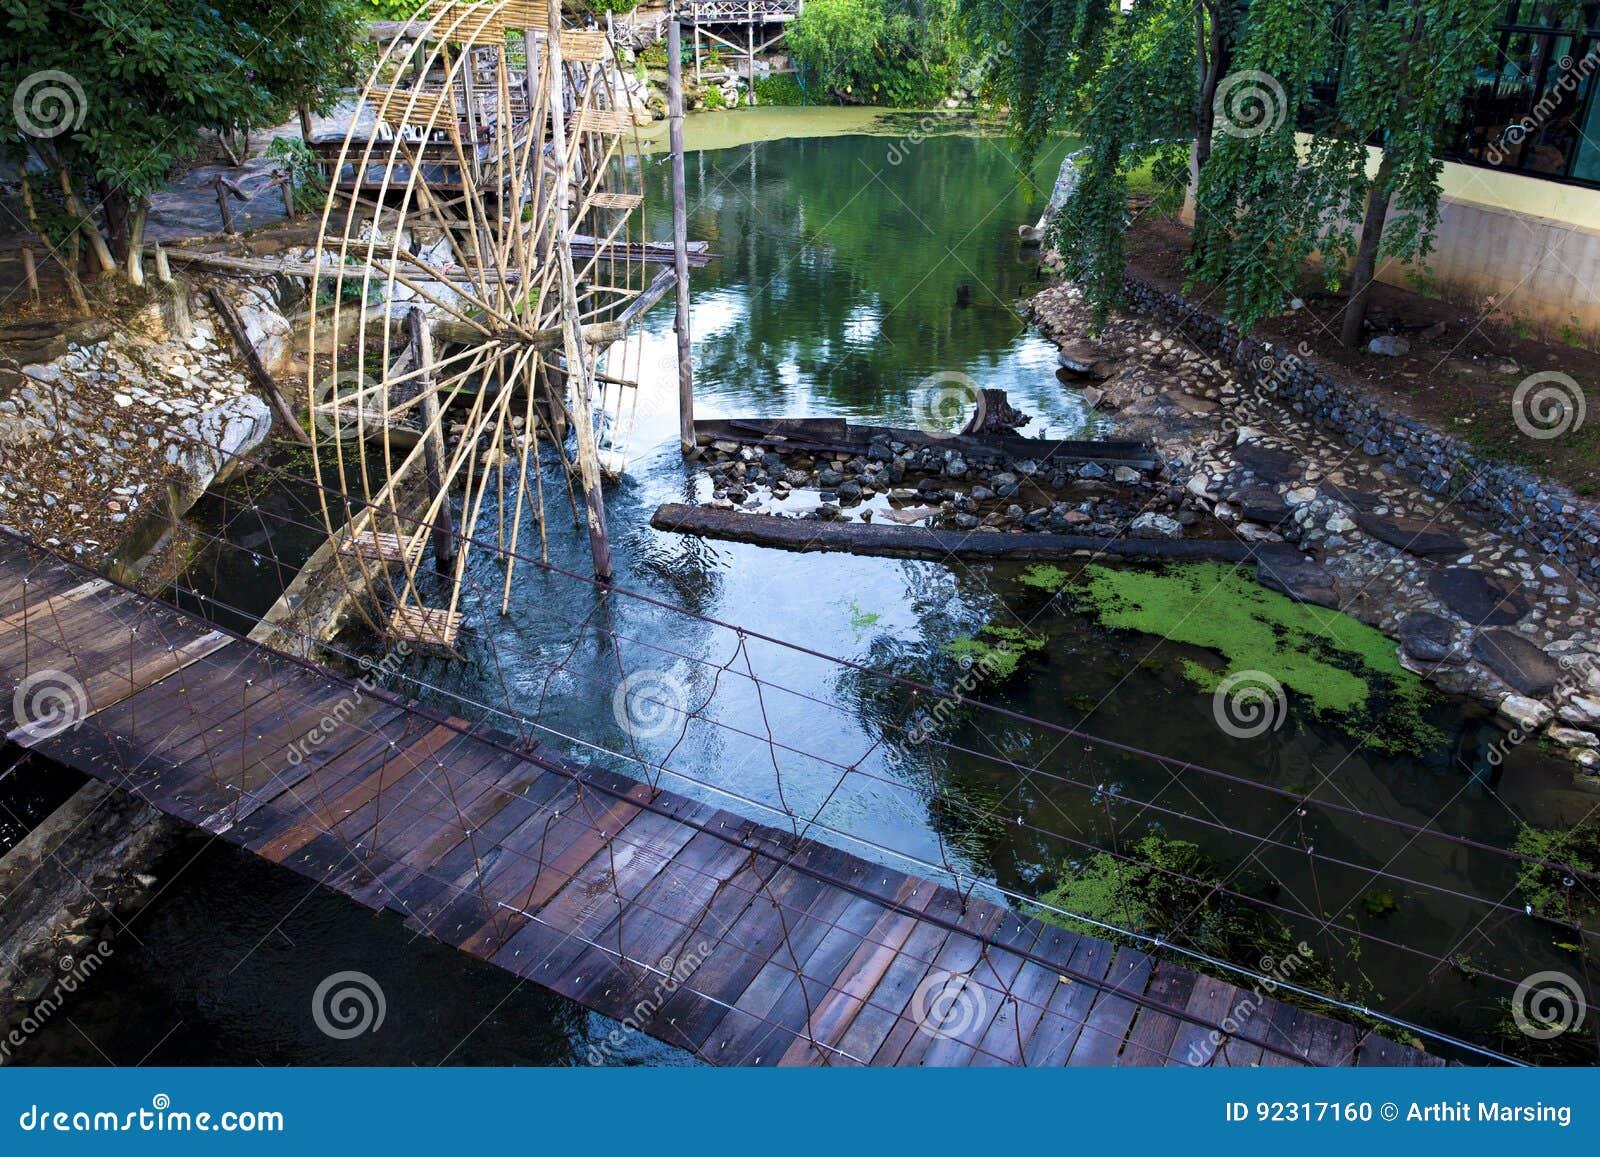 Download Garden Decoration Ideas, Wooden Hanging Bridge, Water Wheel. Stock  Photo   Image